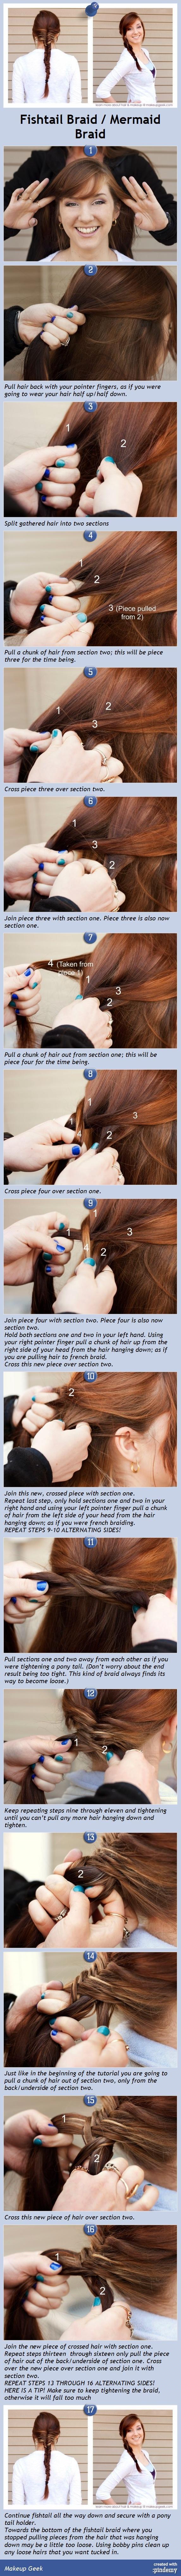 Fishtail Braid / Mermaid Braid tutorial